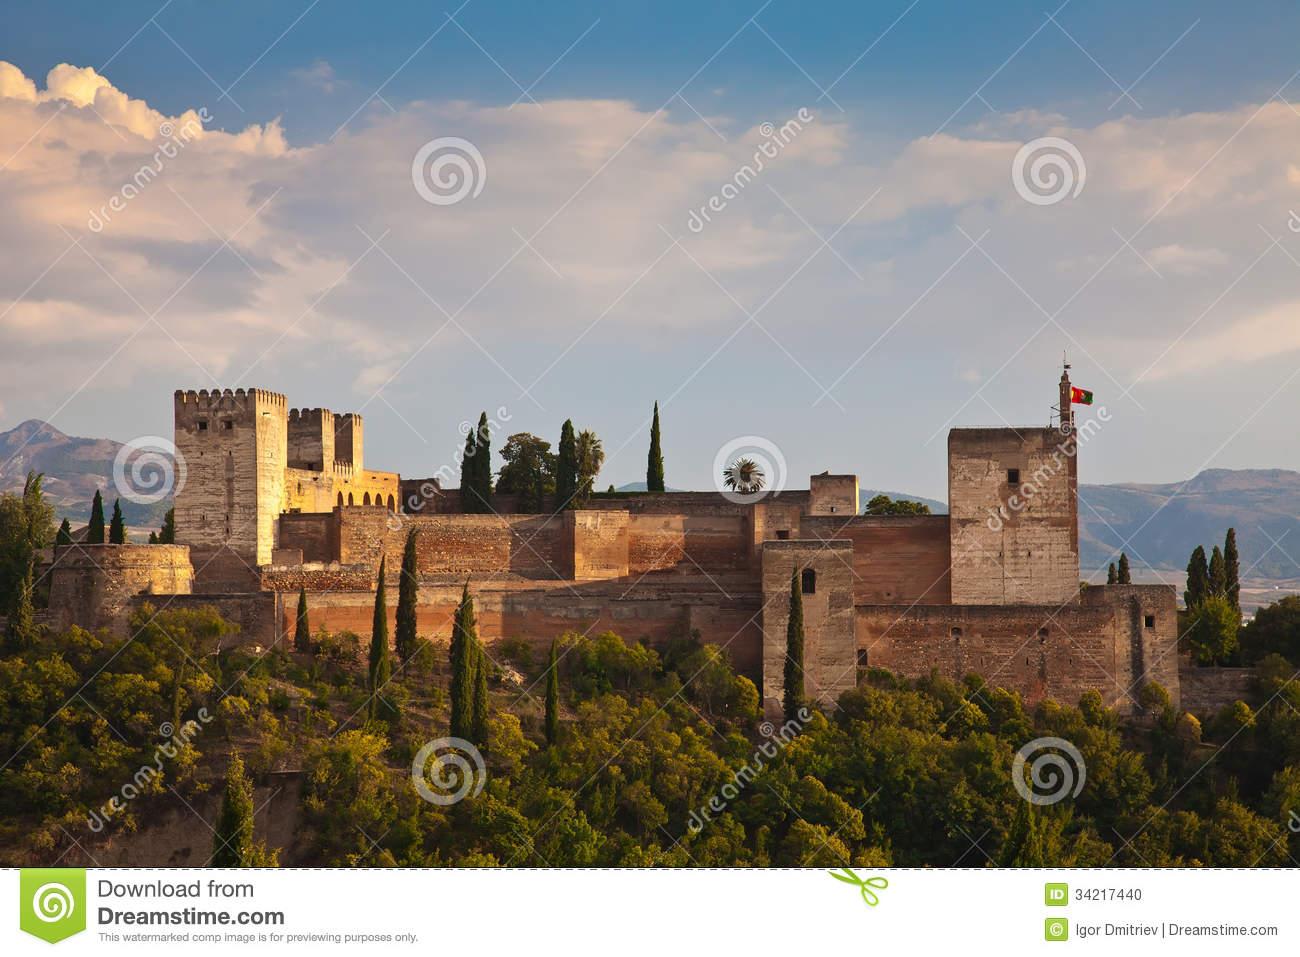 Ancient Arabic Fortress Of Alhambra, Granada, Spain Stock Photo.